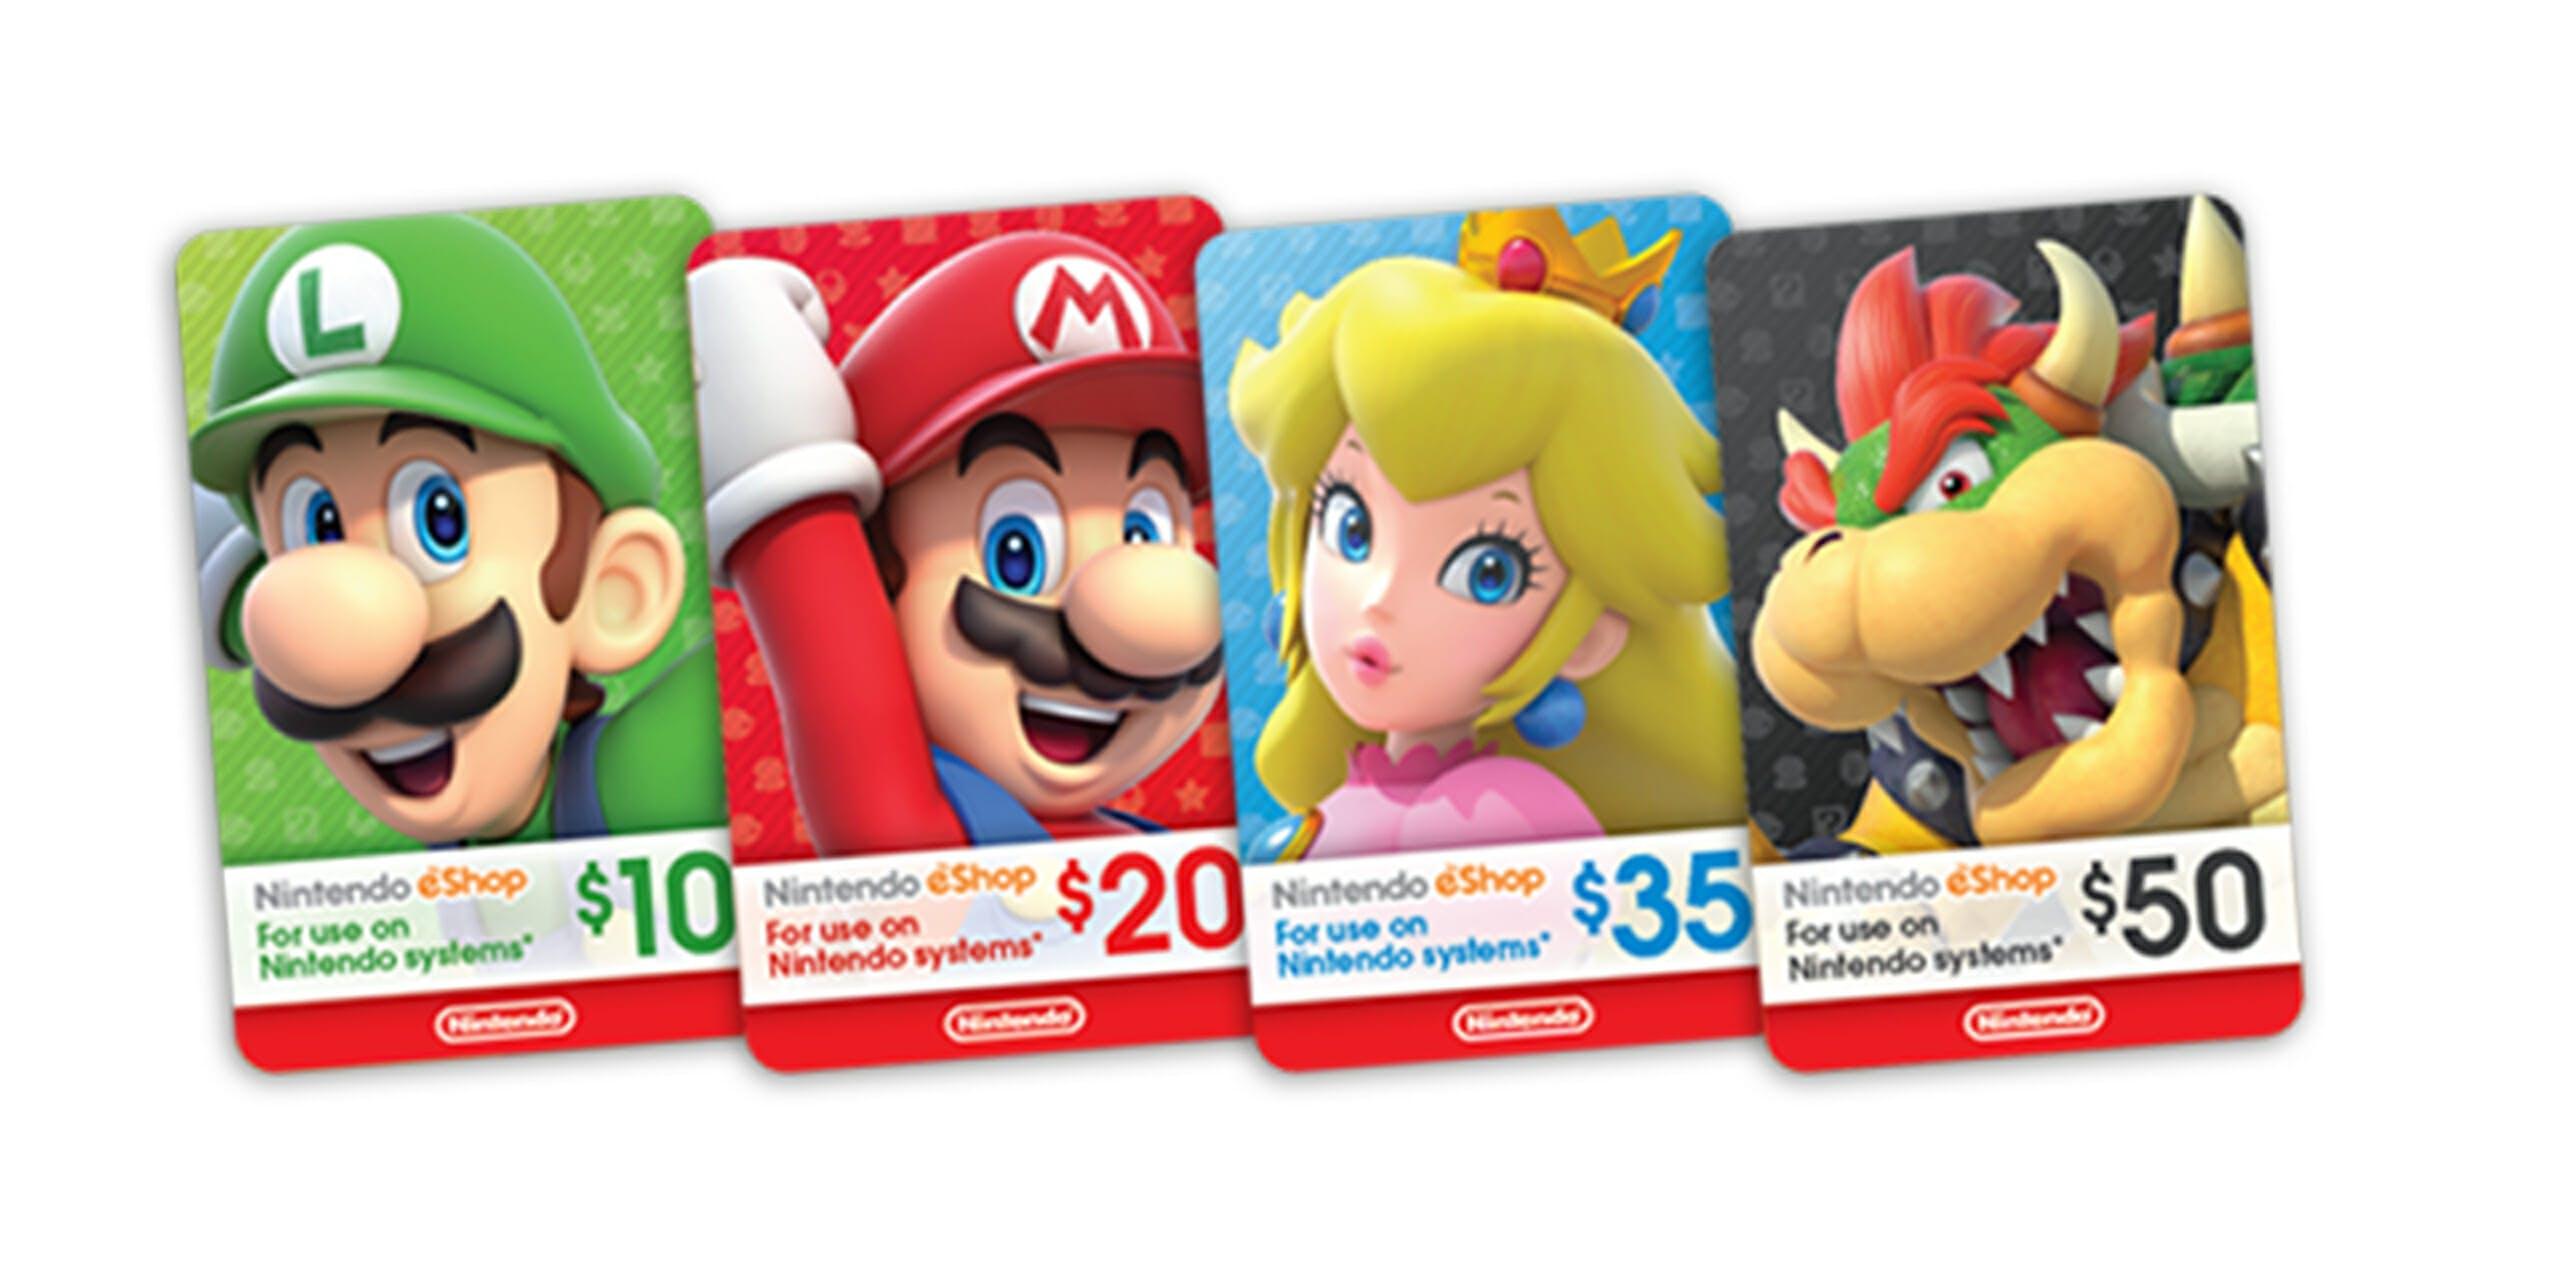 Nintendo Switch eshop card